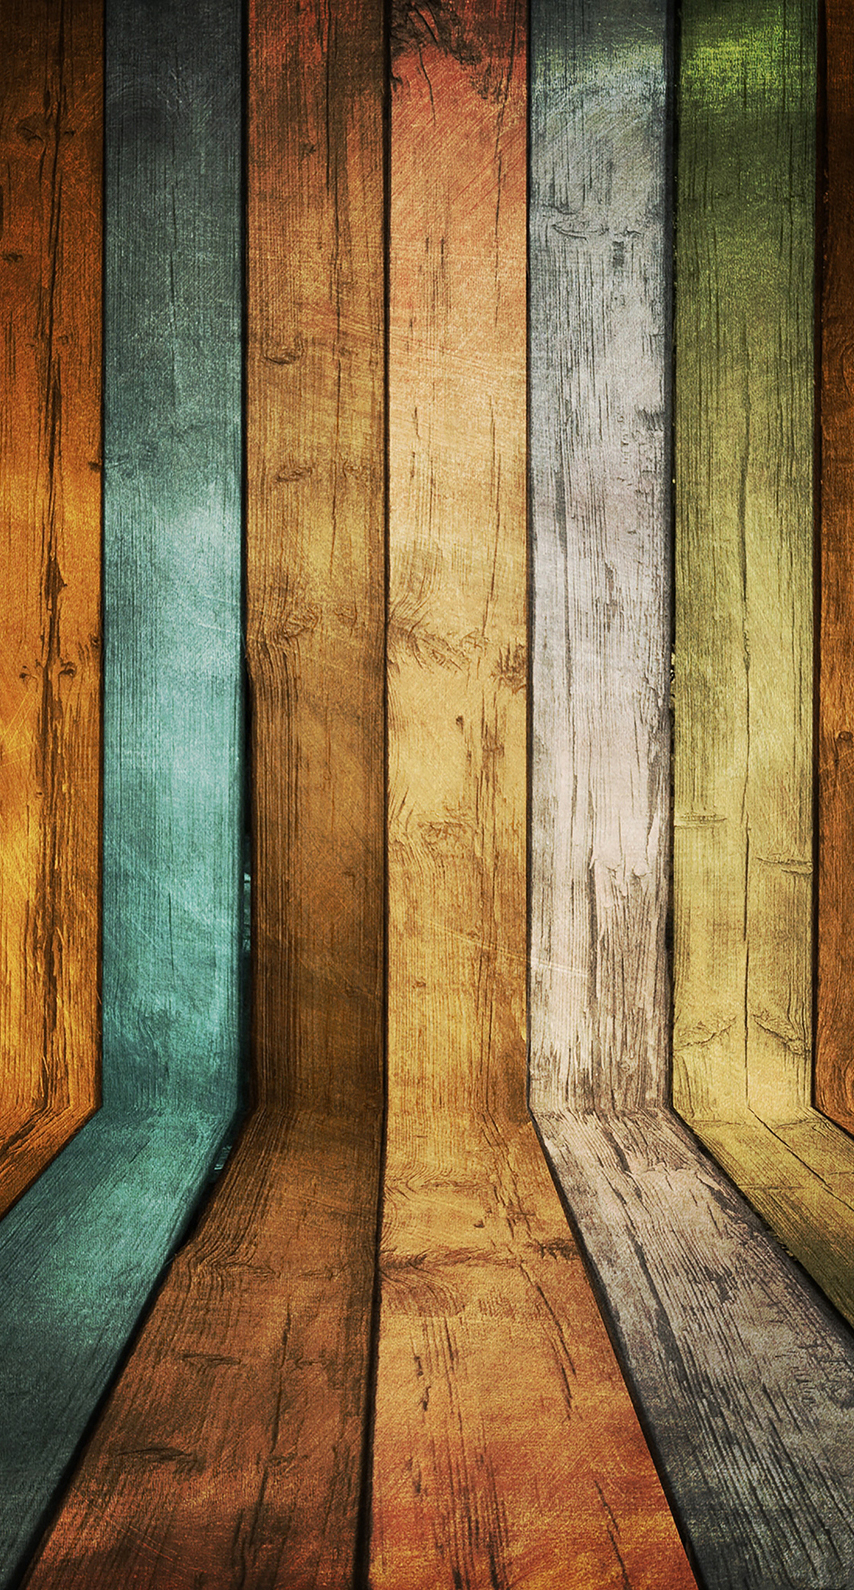 hardwood, dirty, empty, inside, floor, log, rough, rustic, panel, construction